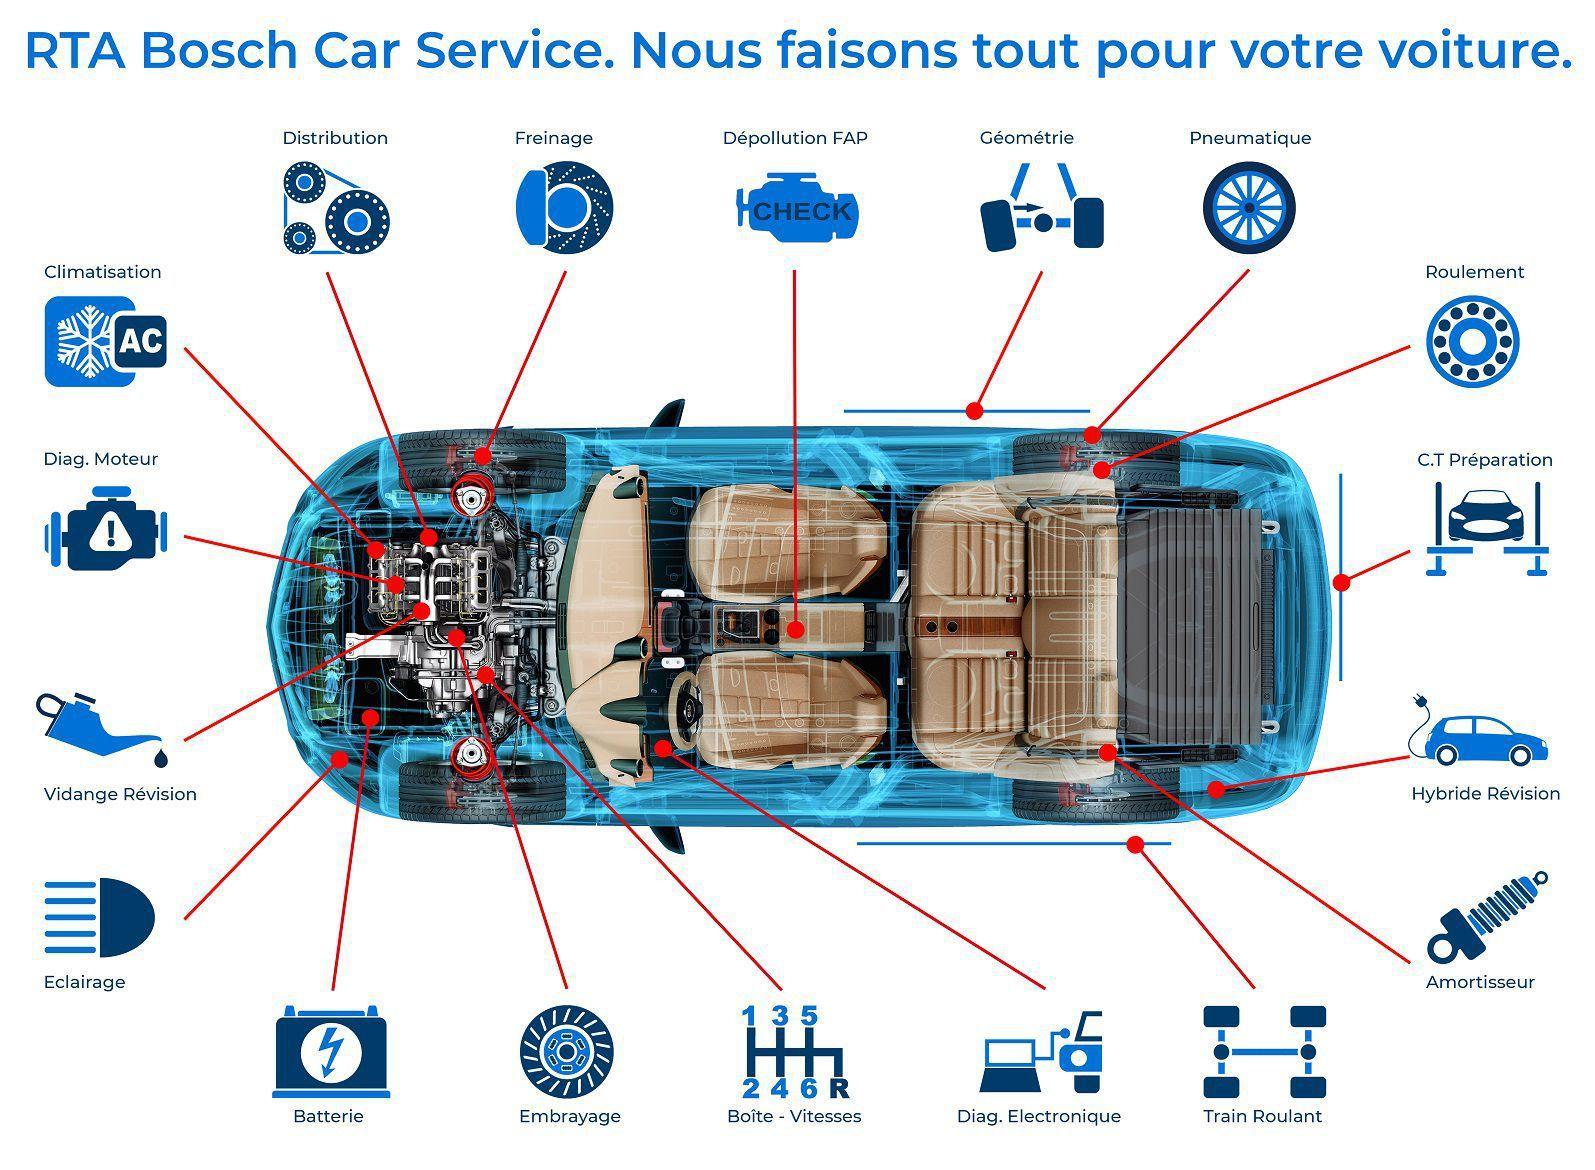 Rta Bosch Car Service Saint Louis